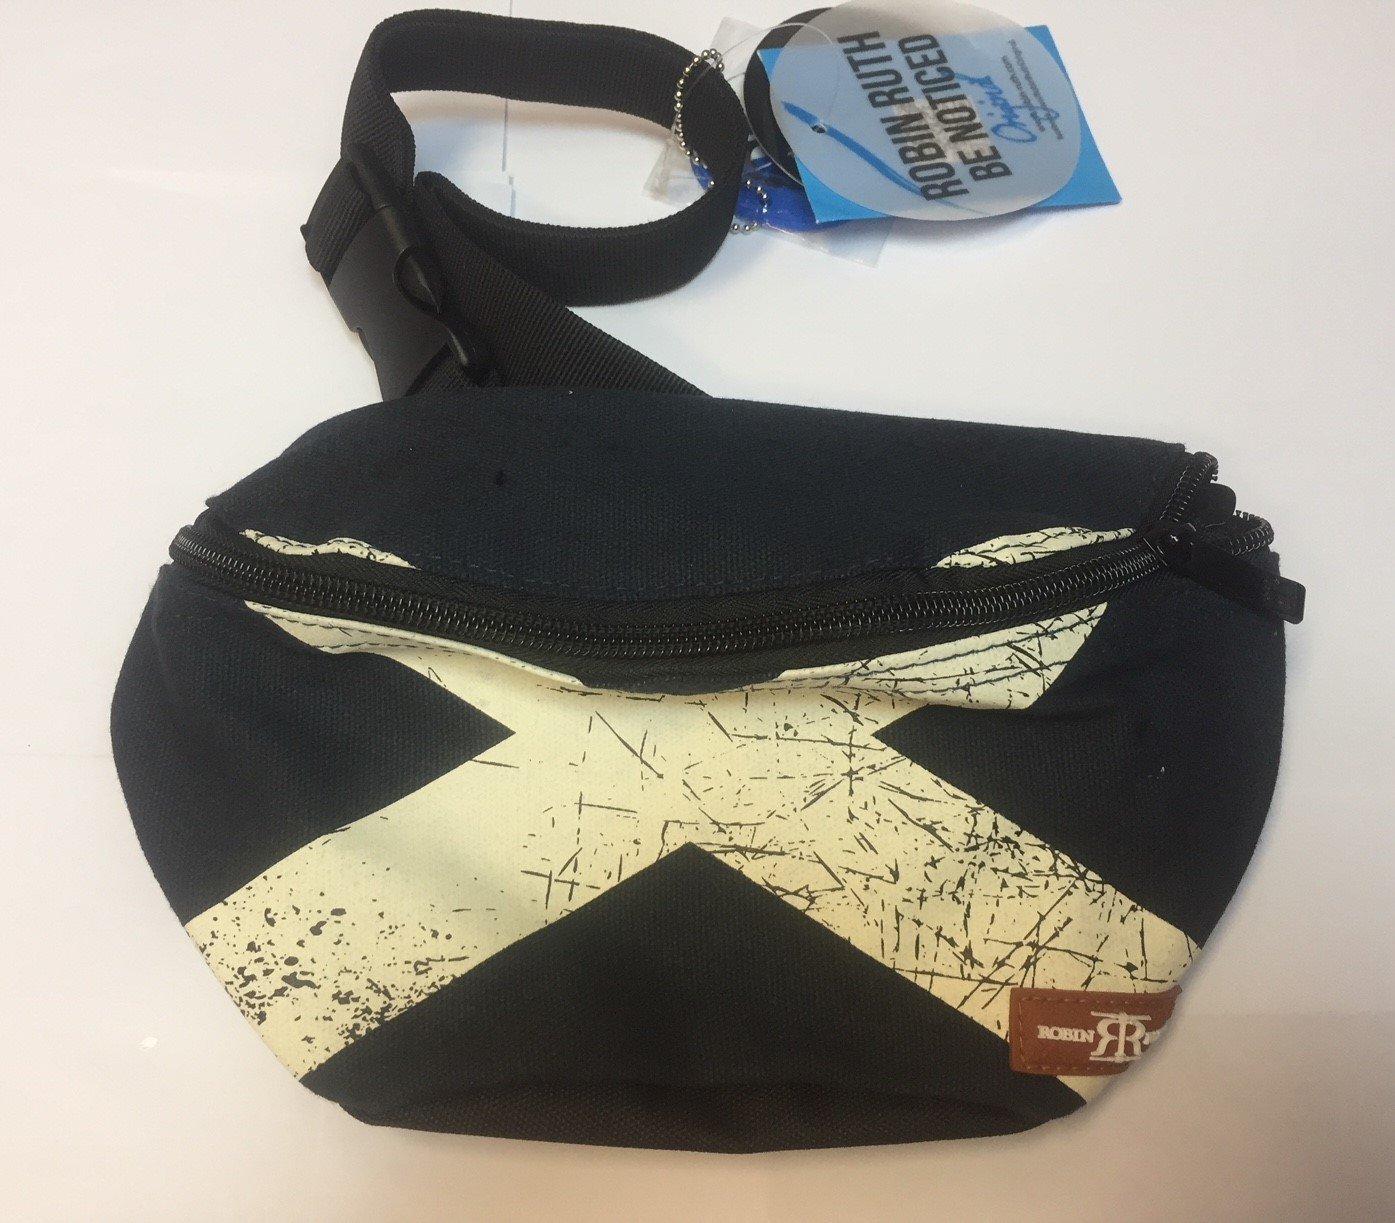 FANCYTHAT /& SCIFI PLANET Scottish Piper /& Nessie Snowglobe